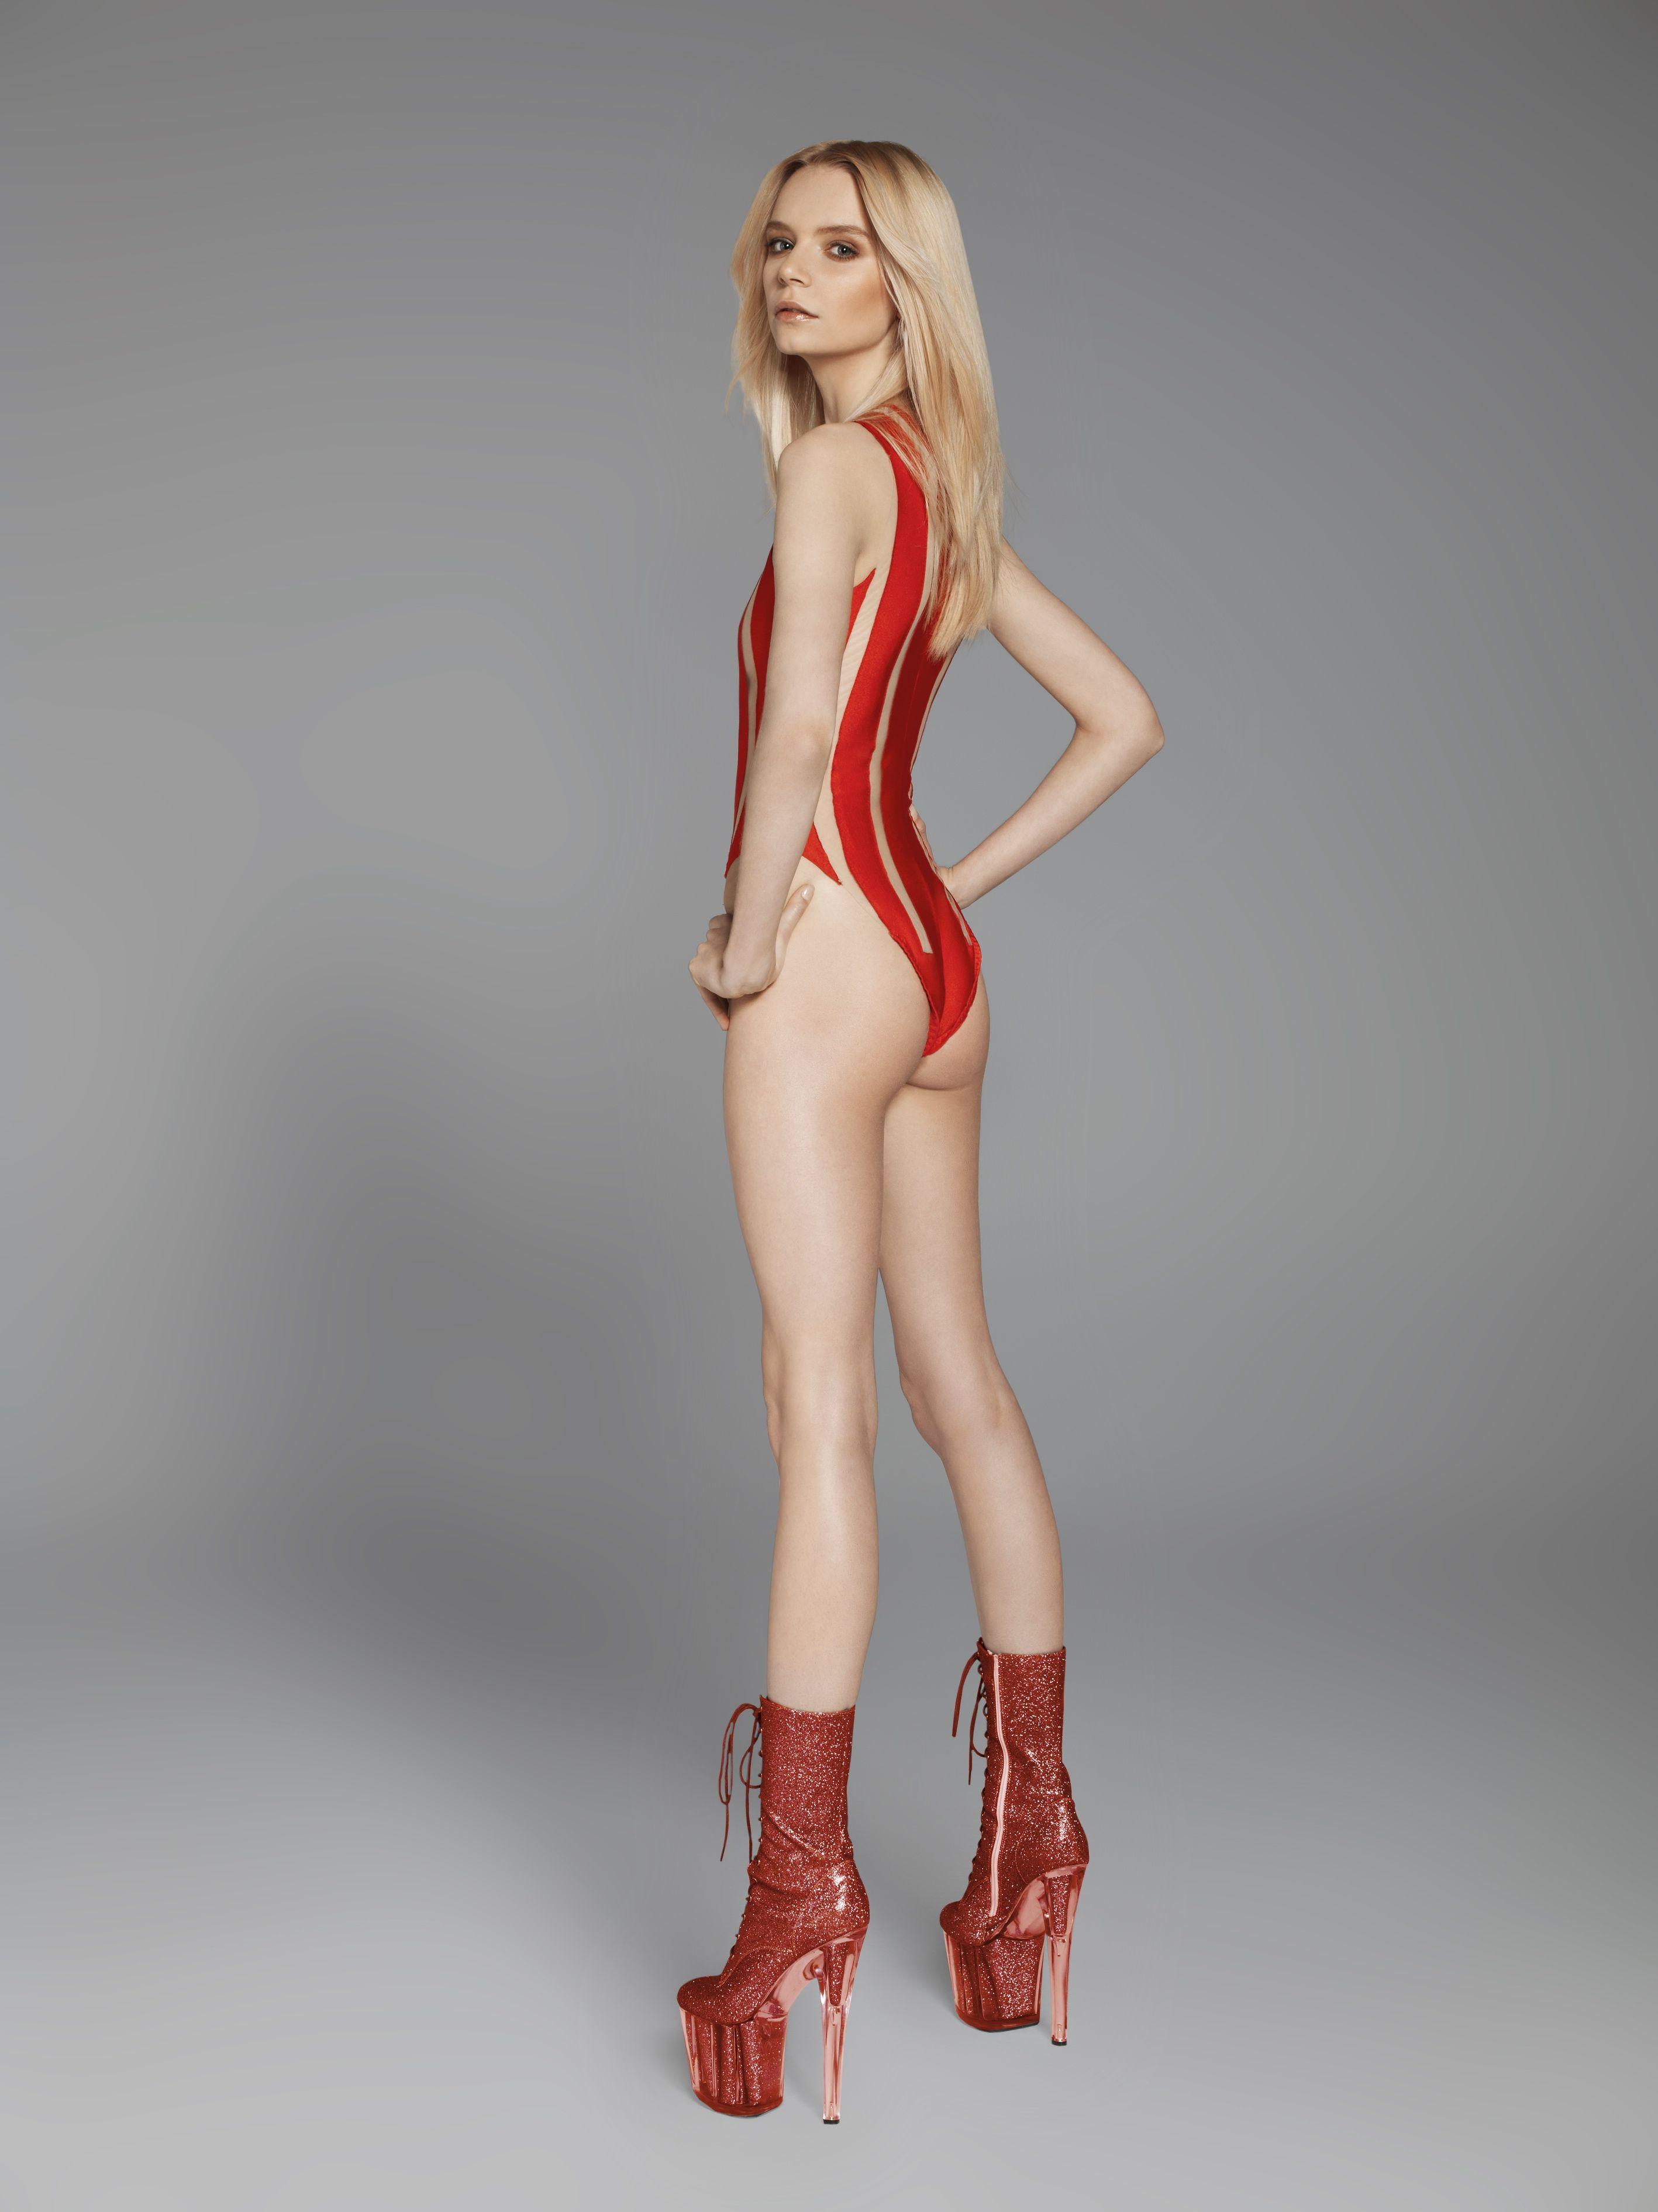 naked-girls-thin-galleries-blade